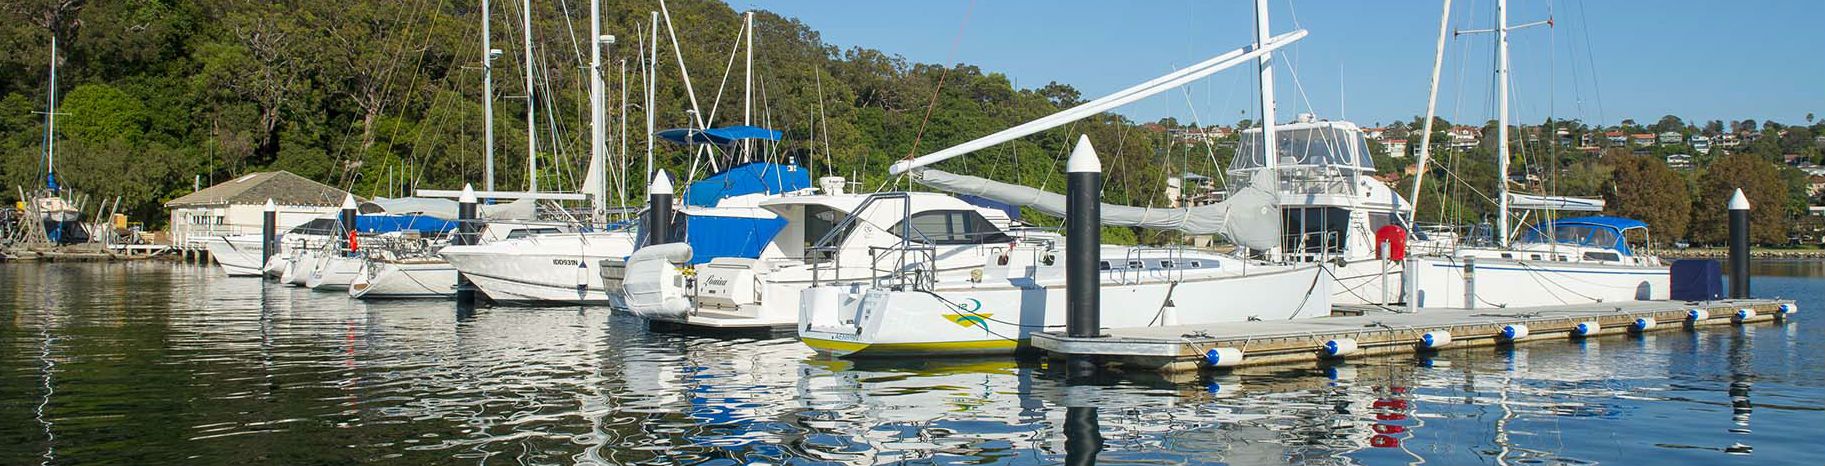 Pick up and drop off pontoon